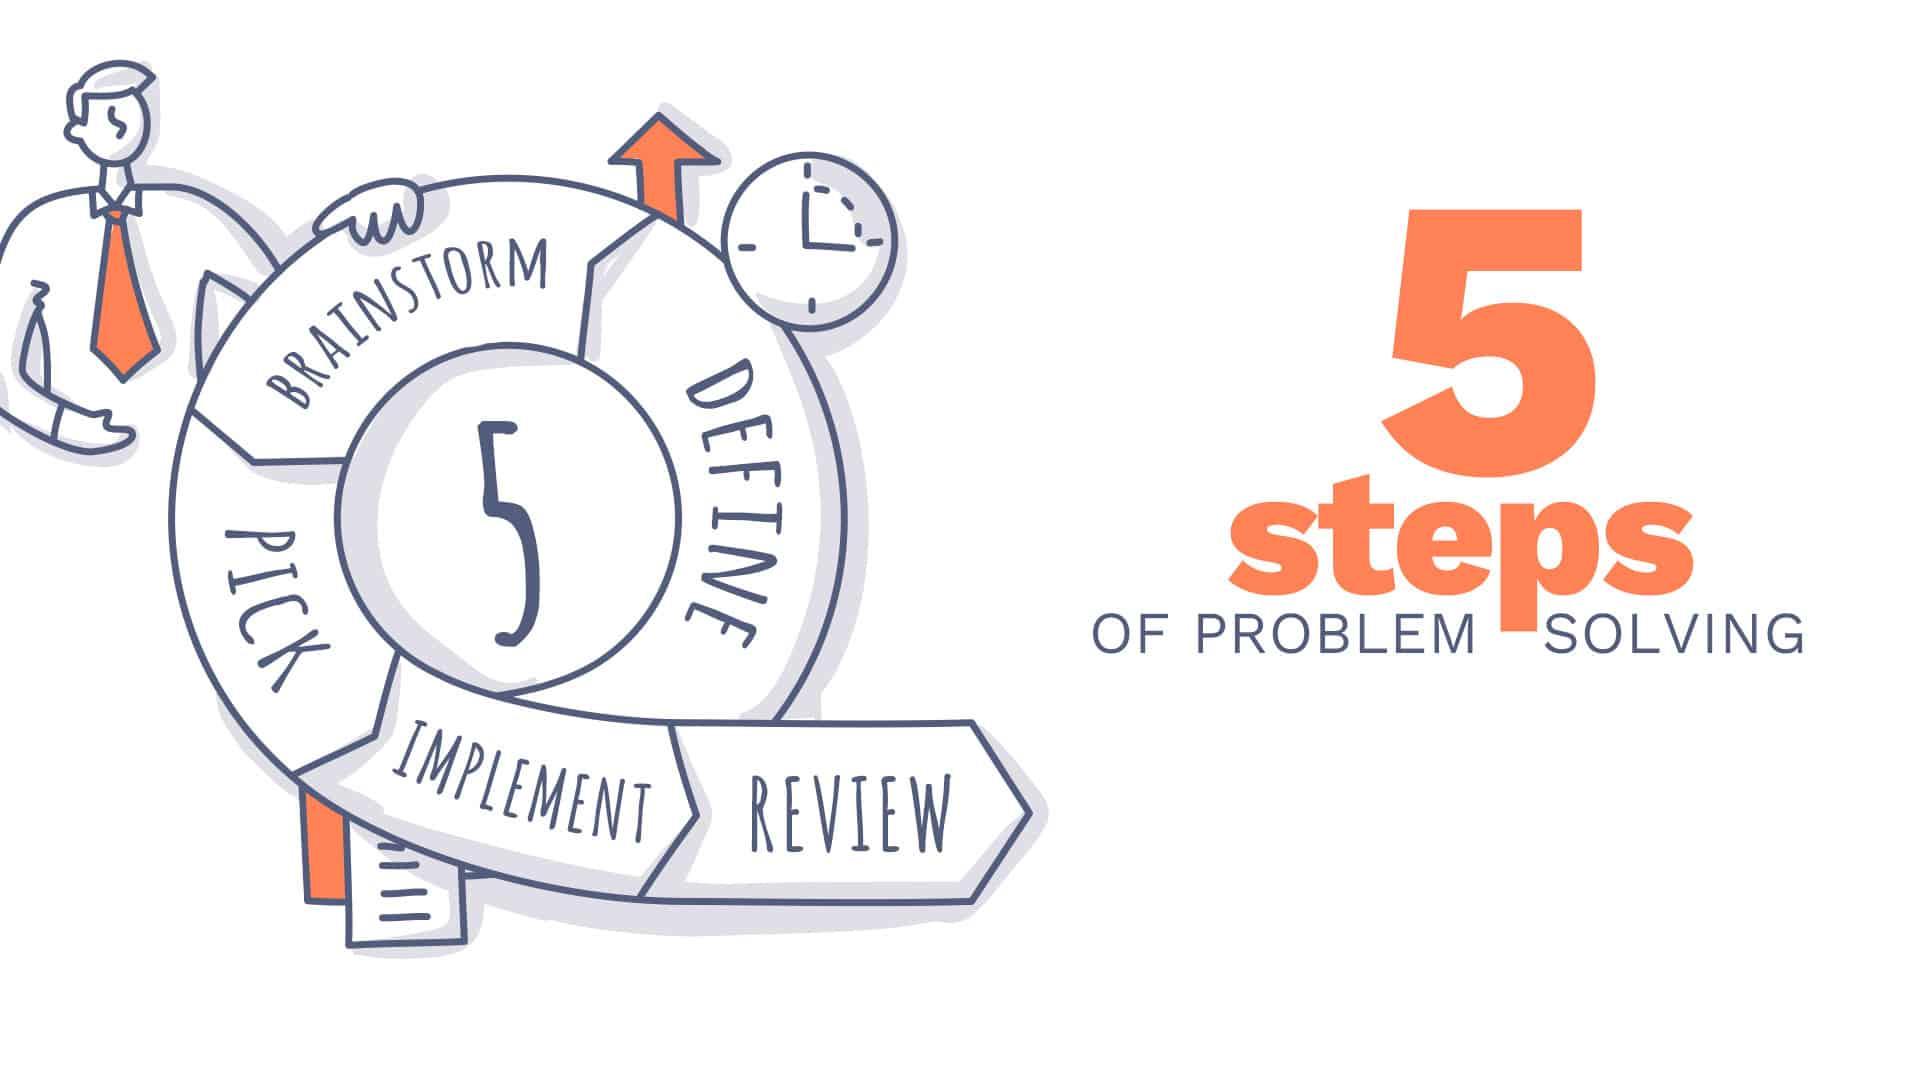 5-steps-of-problem-solving-humor-that-works